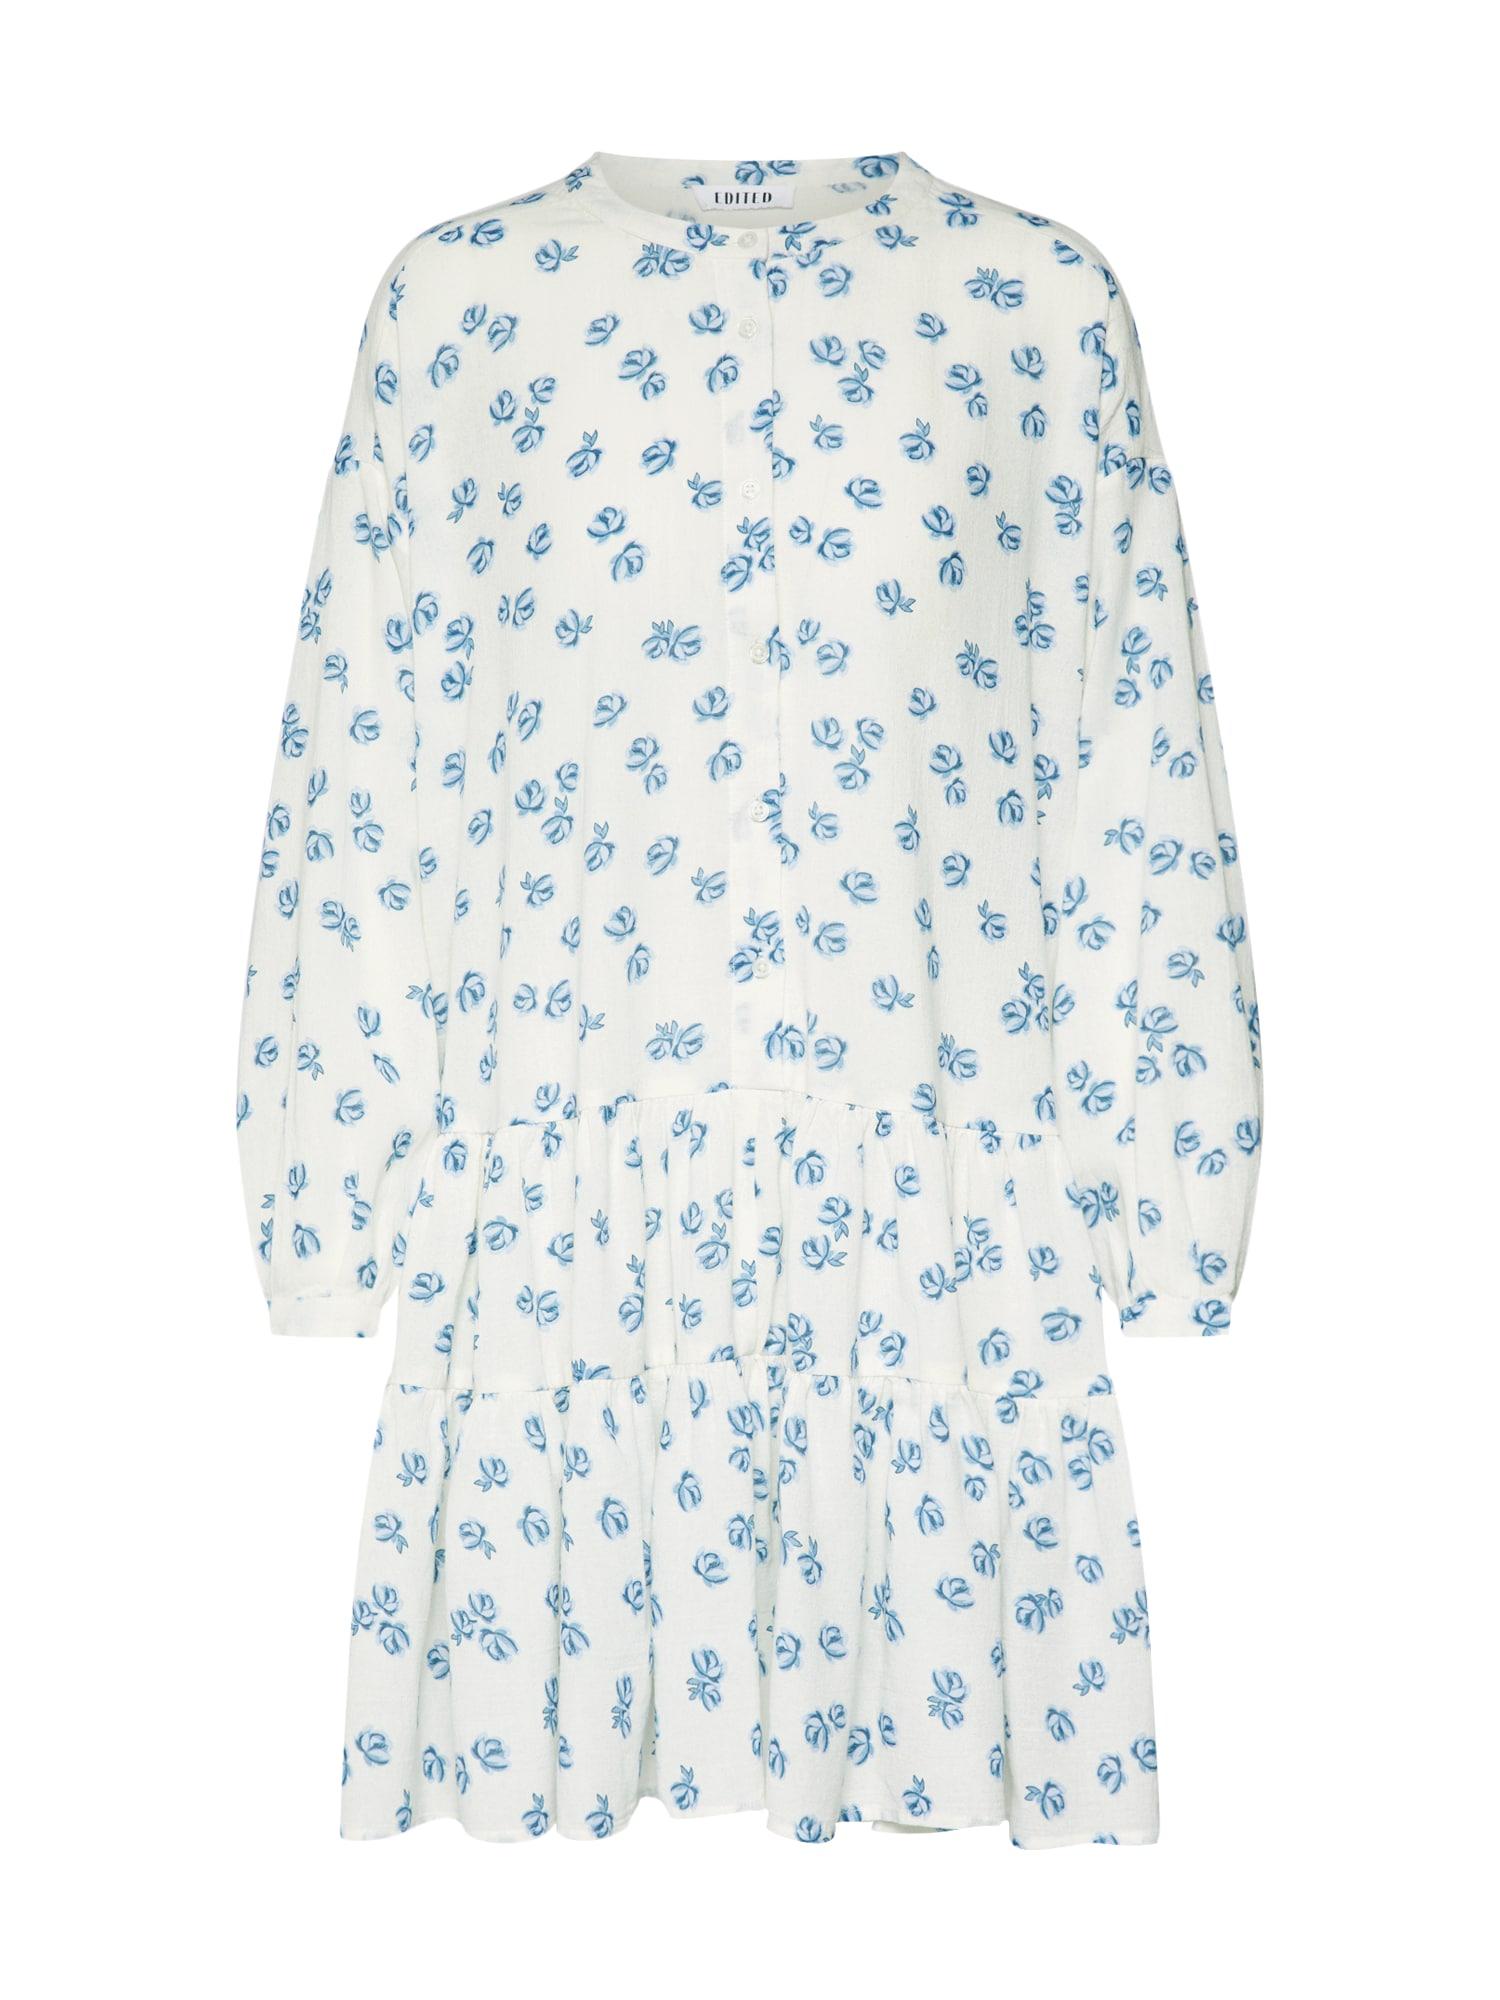 Šaty Dorisa modrá bílá EDITED